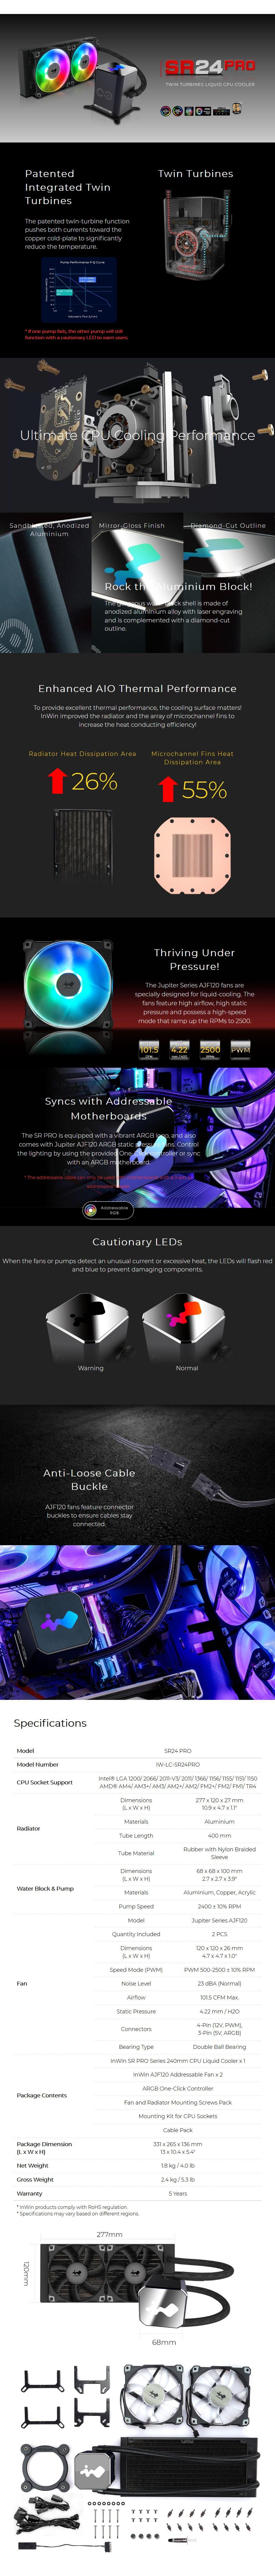 In Win SR24 Pro 240mm ARGB All-in-One Liquid CPU Cooler - Desktop Overview 1